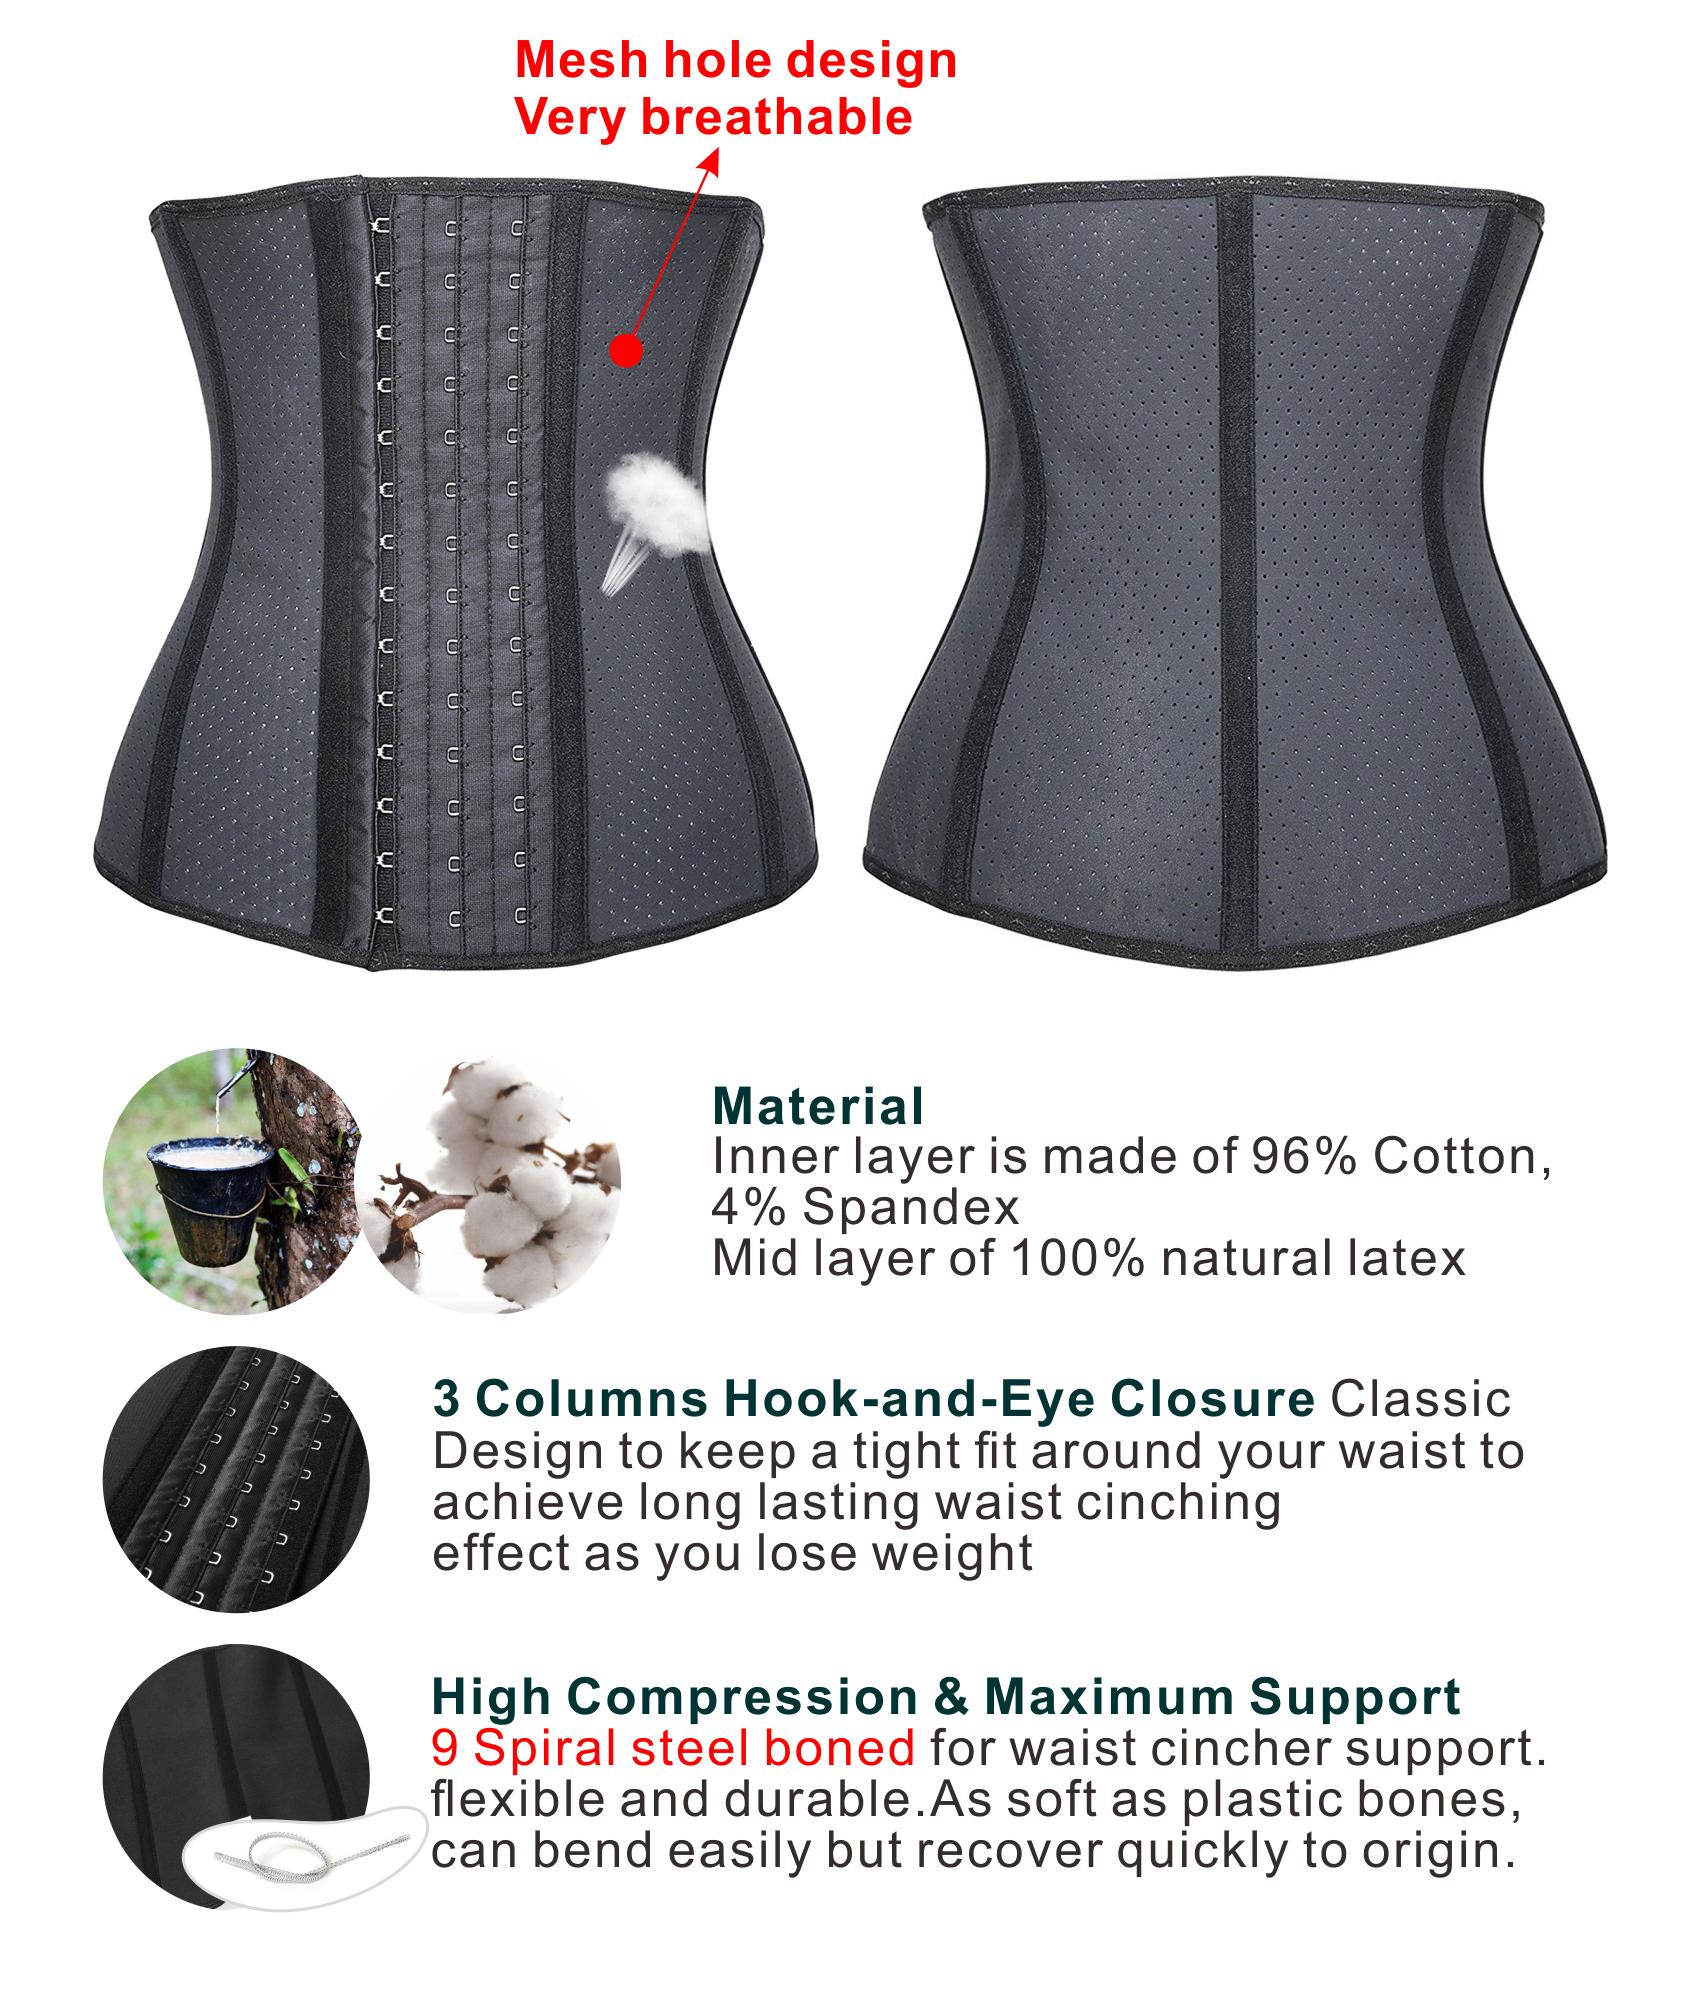 339611c07e7 Camellias Corsets - Camellias Women 25 Steel Boned - Workout Waist Trainer  Shaper Corset For Waist Cincher Weight Loss Tummy Control Body Shapewear  Beige